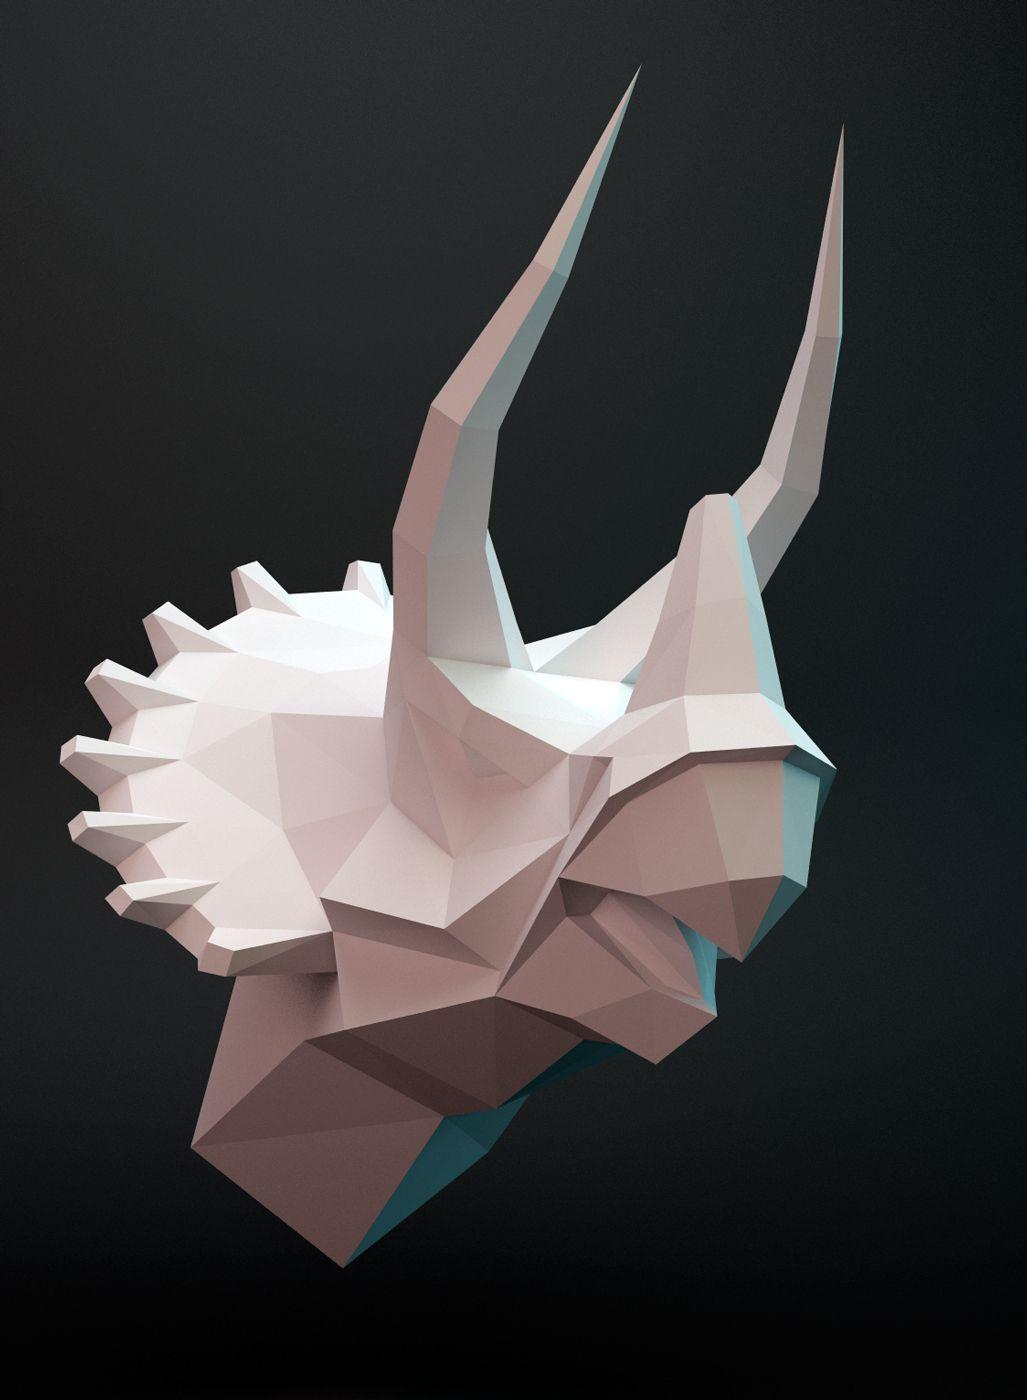 3D Papercraft Model Downloadable